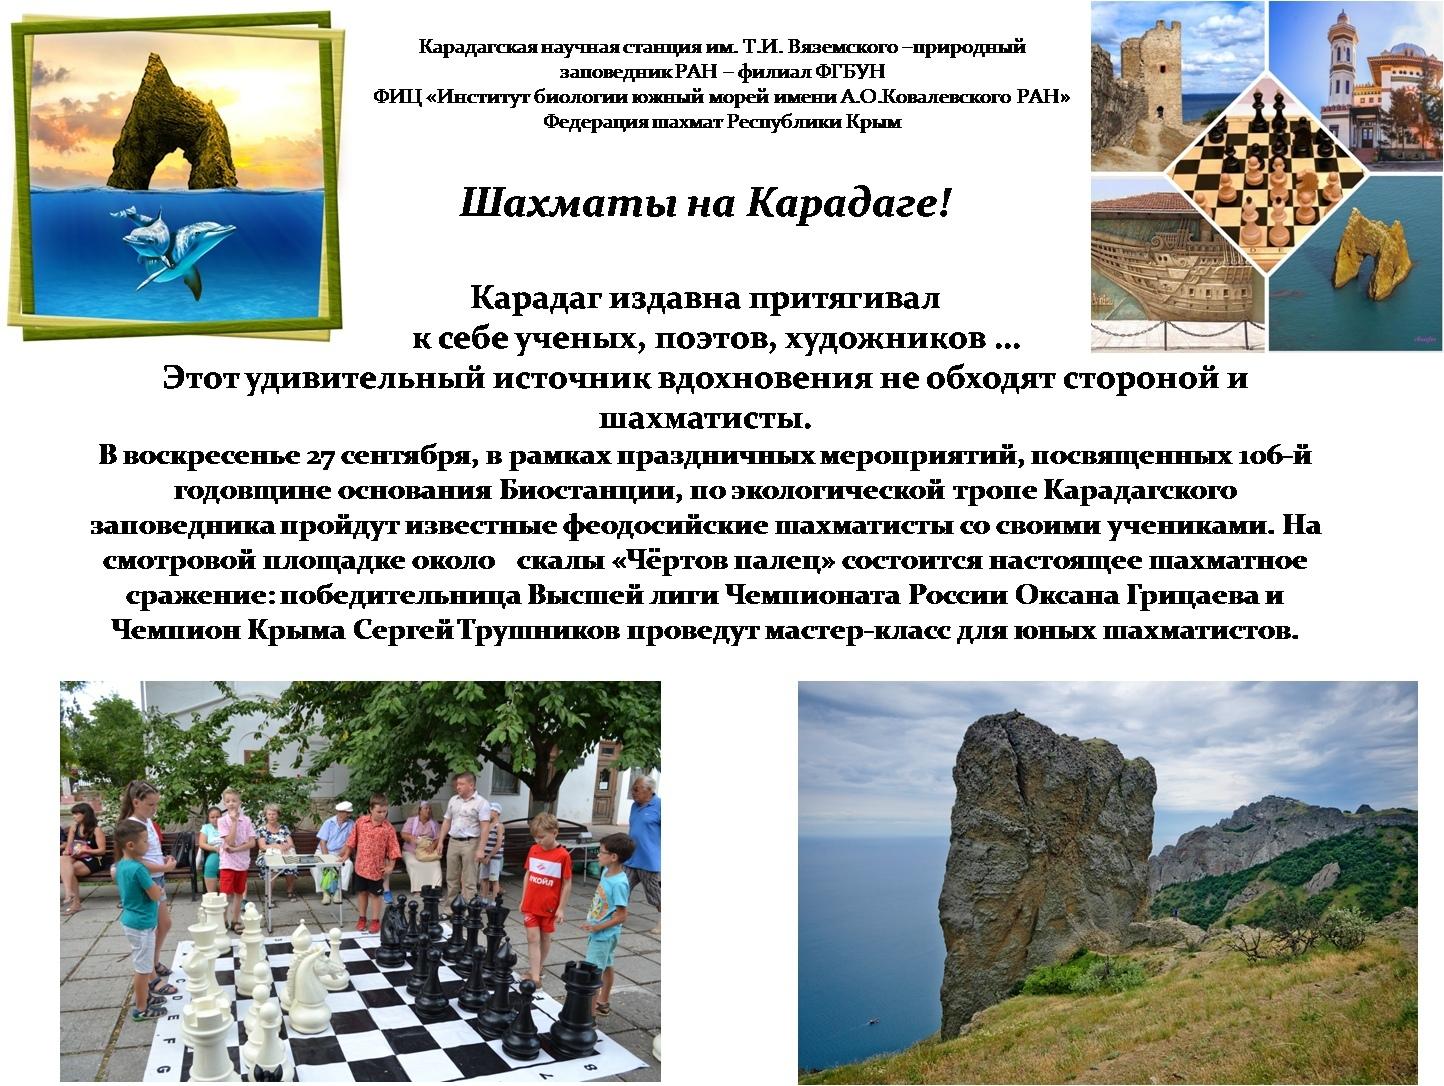 Шахматы на Карадаге!